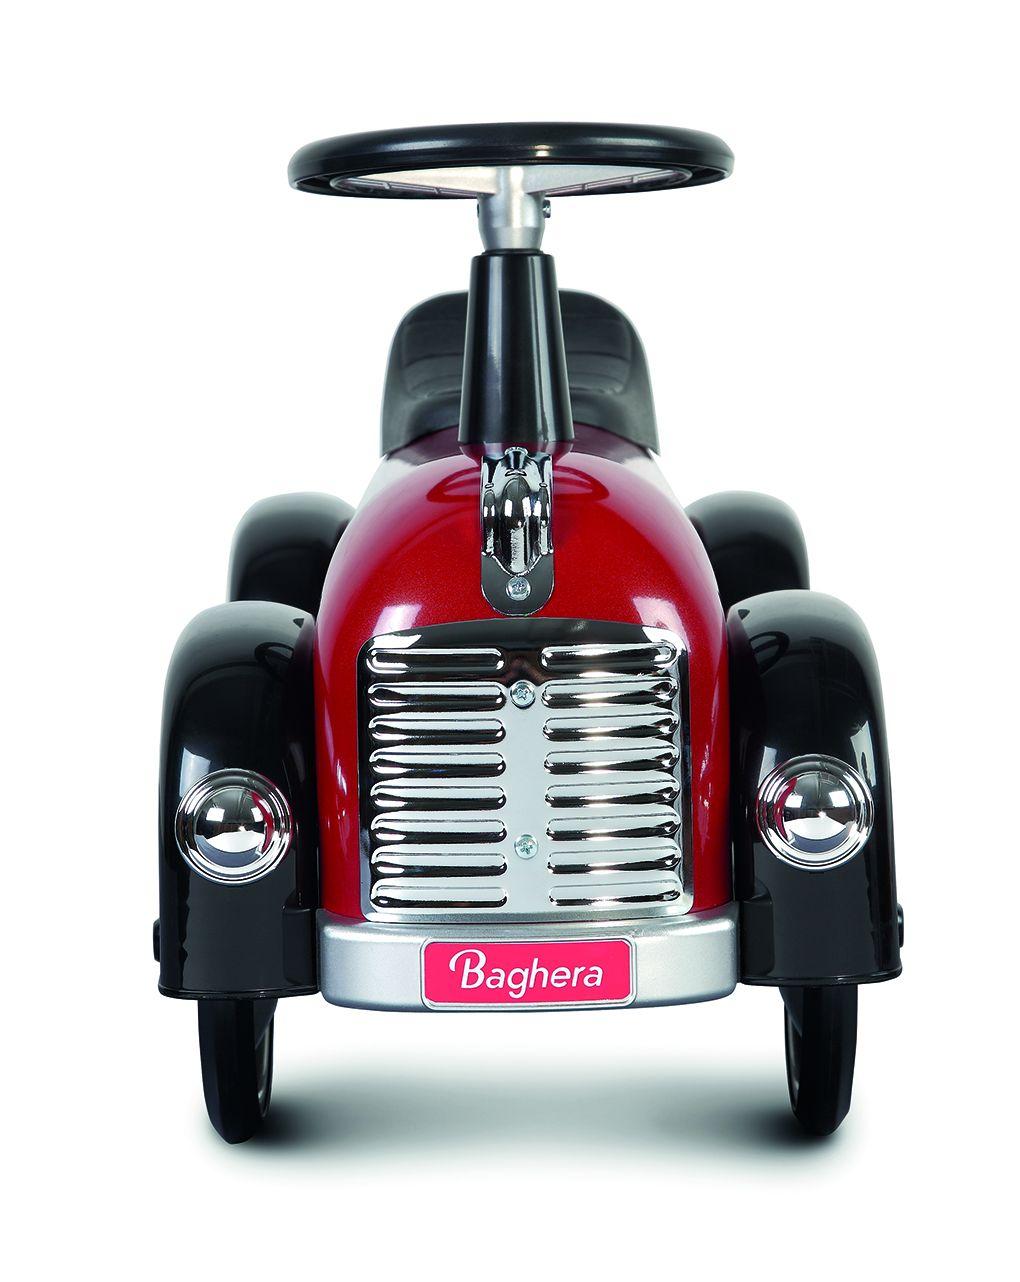 Baghera - speedster dark red - Baghera